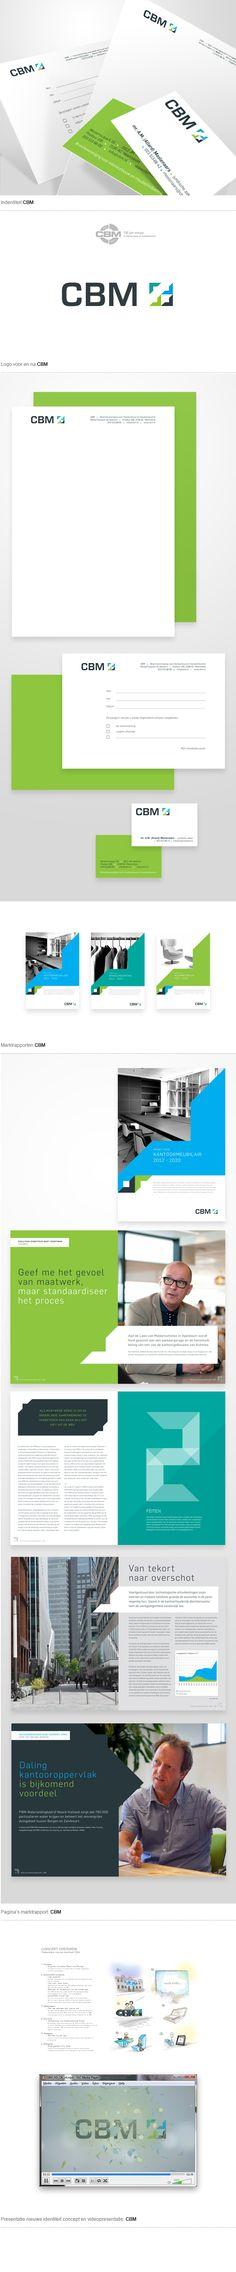 CBM | Sixtyseven | Communication and advertising | Beverwijk